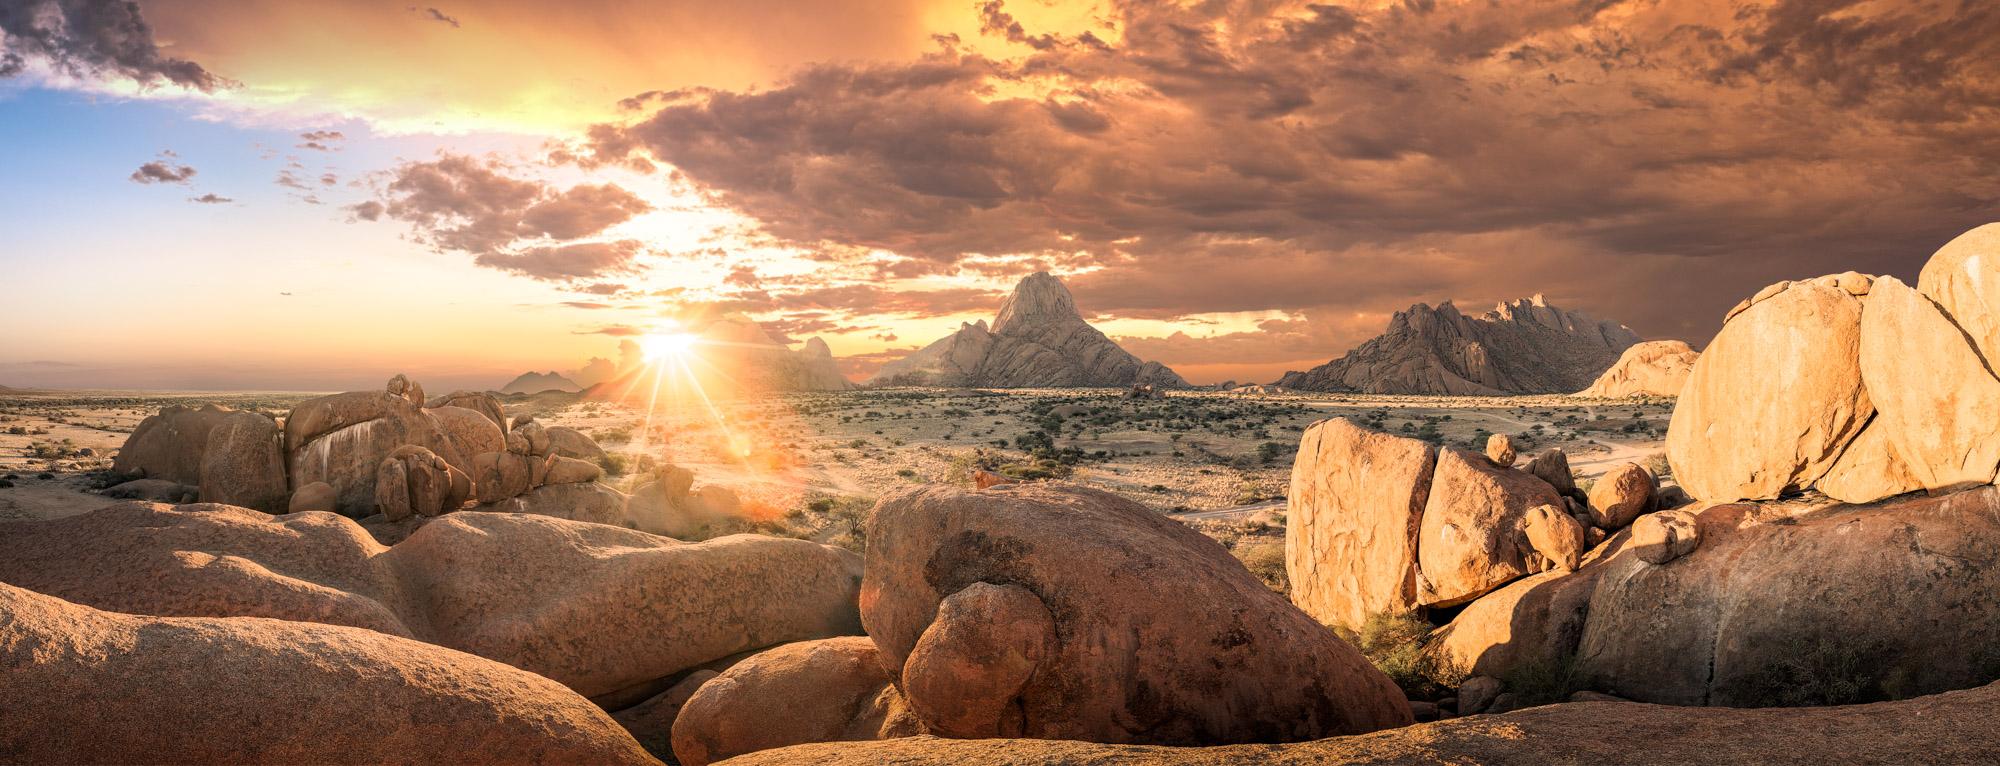 Dramatic Sunset At Spitzkoppe